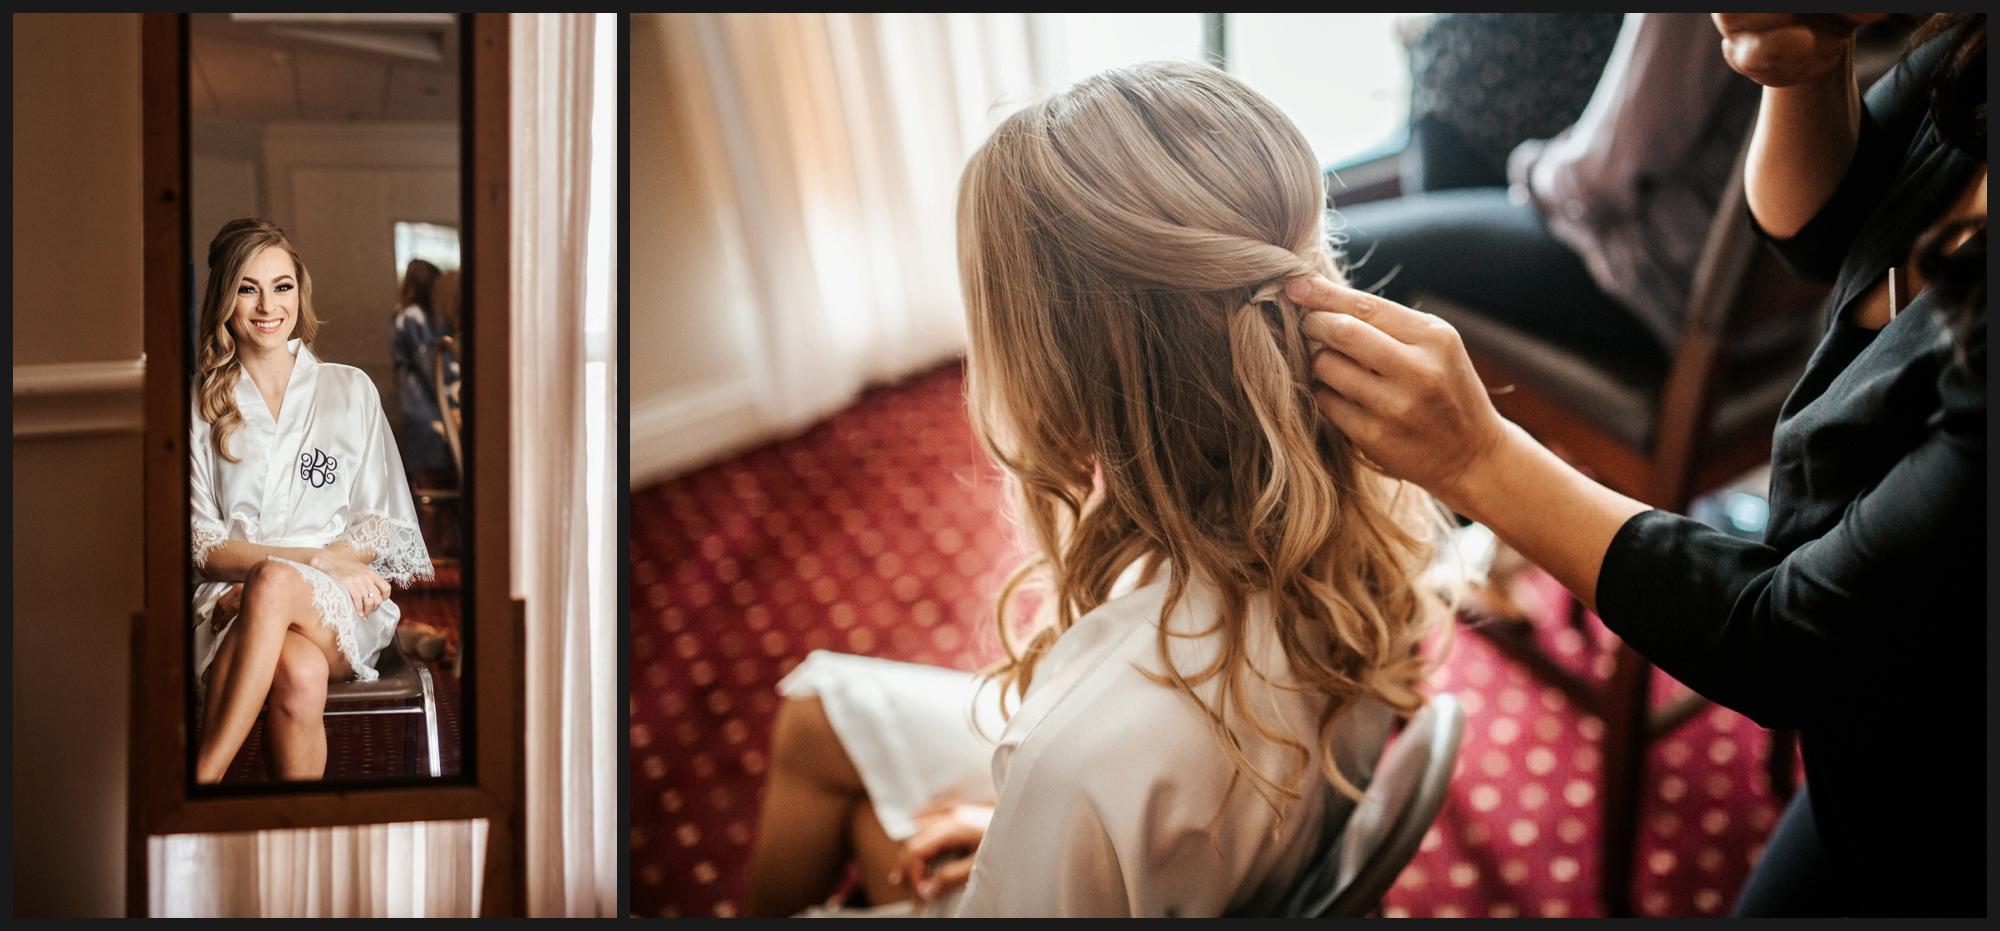 Orlando-Wedding-Photographer-destination-wedding-photographer-florida-wedding-photographer-bohemian-wedding-photographer_0004.jpg